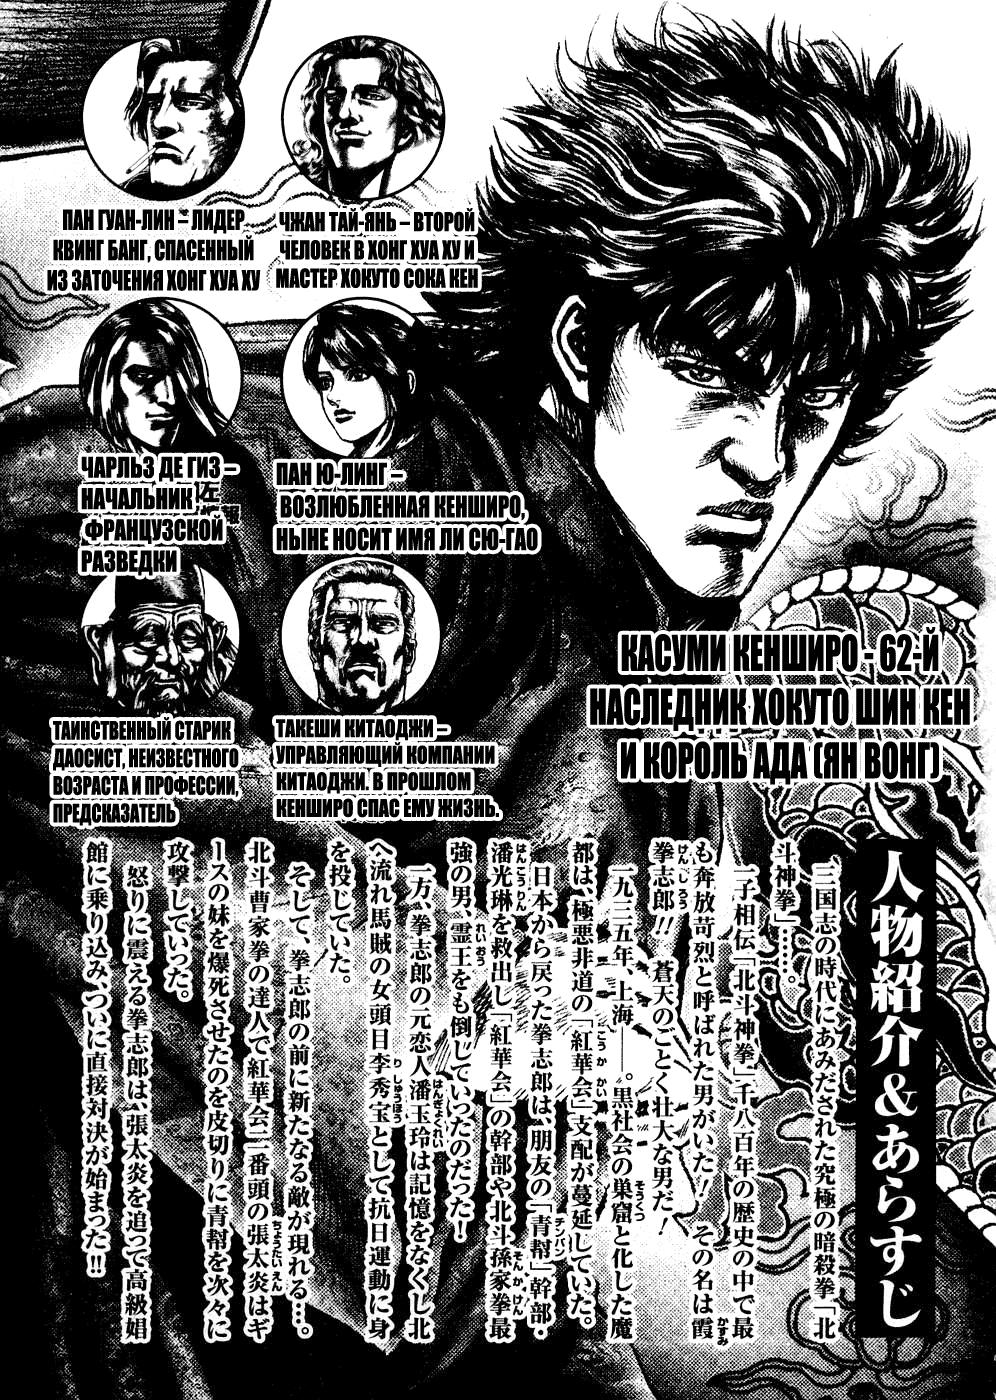 https://r1.ninemanga.com/comics/pic2/6/29190/307411/1471065388489.jpg Page 3